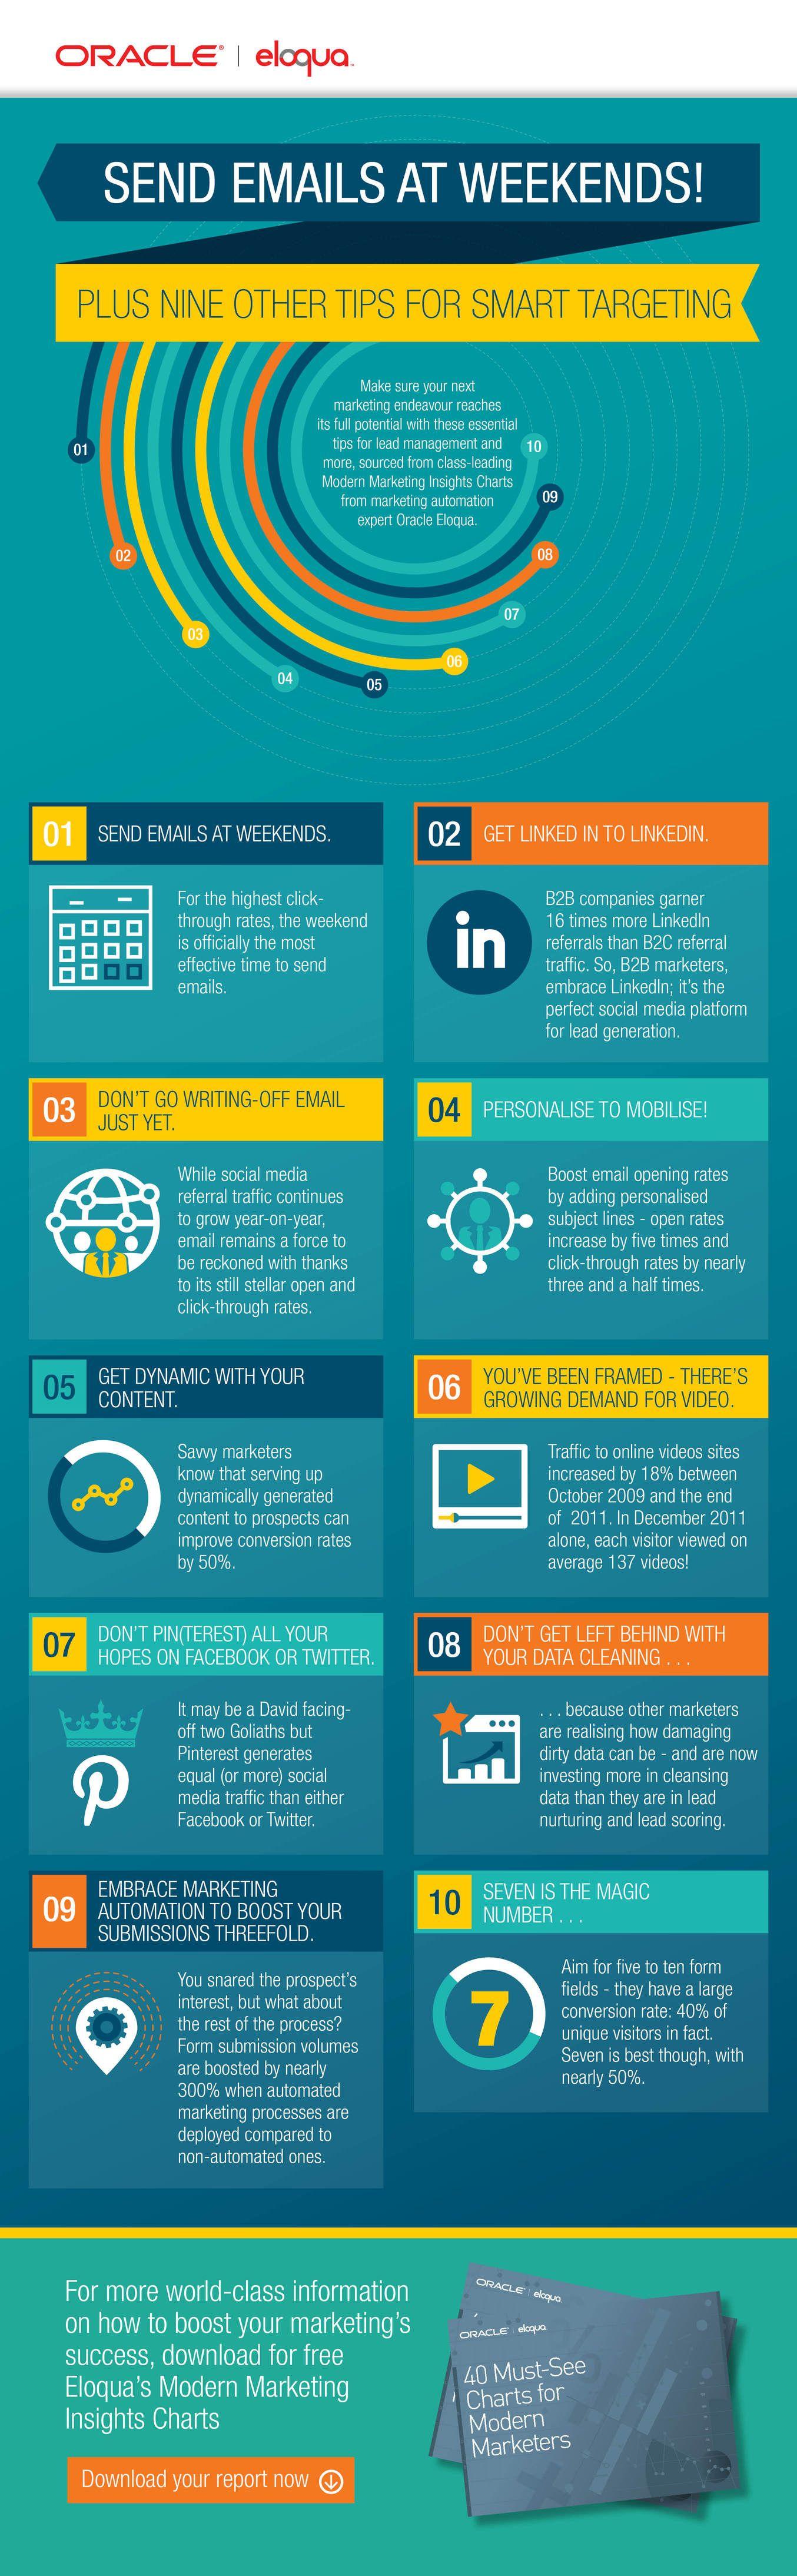 10 Tips For Smart, Targeted #DigitalMarketing - #infographic